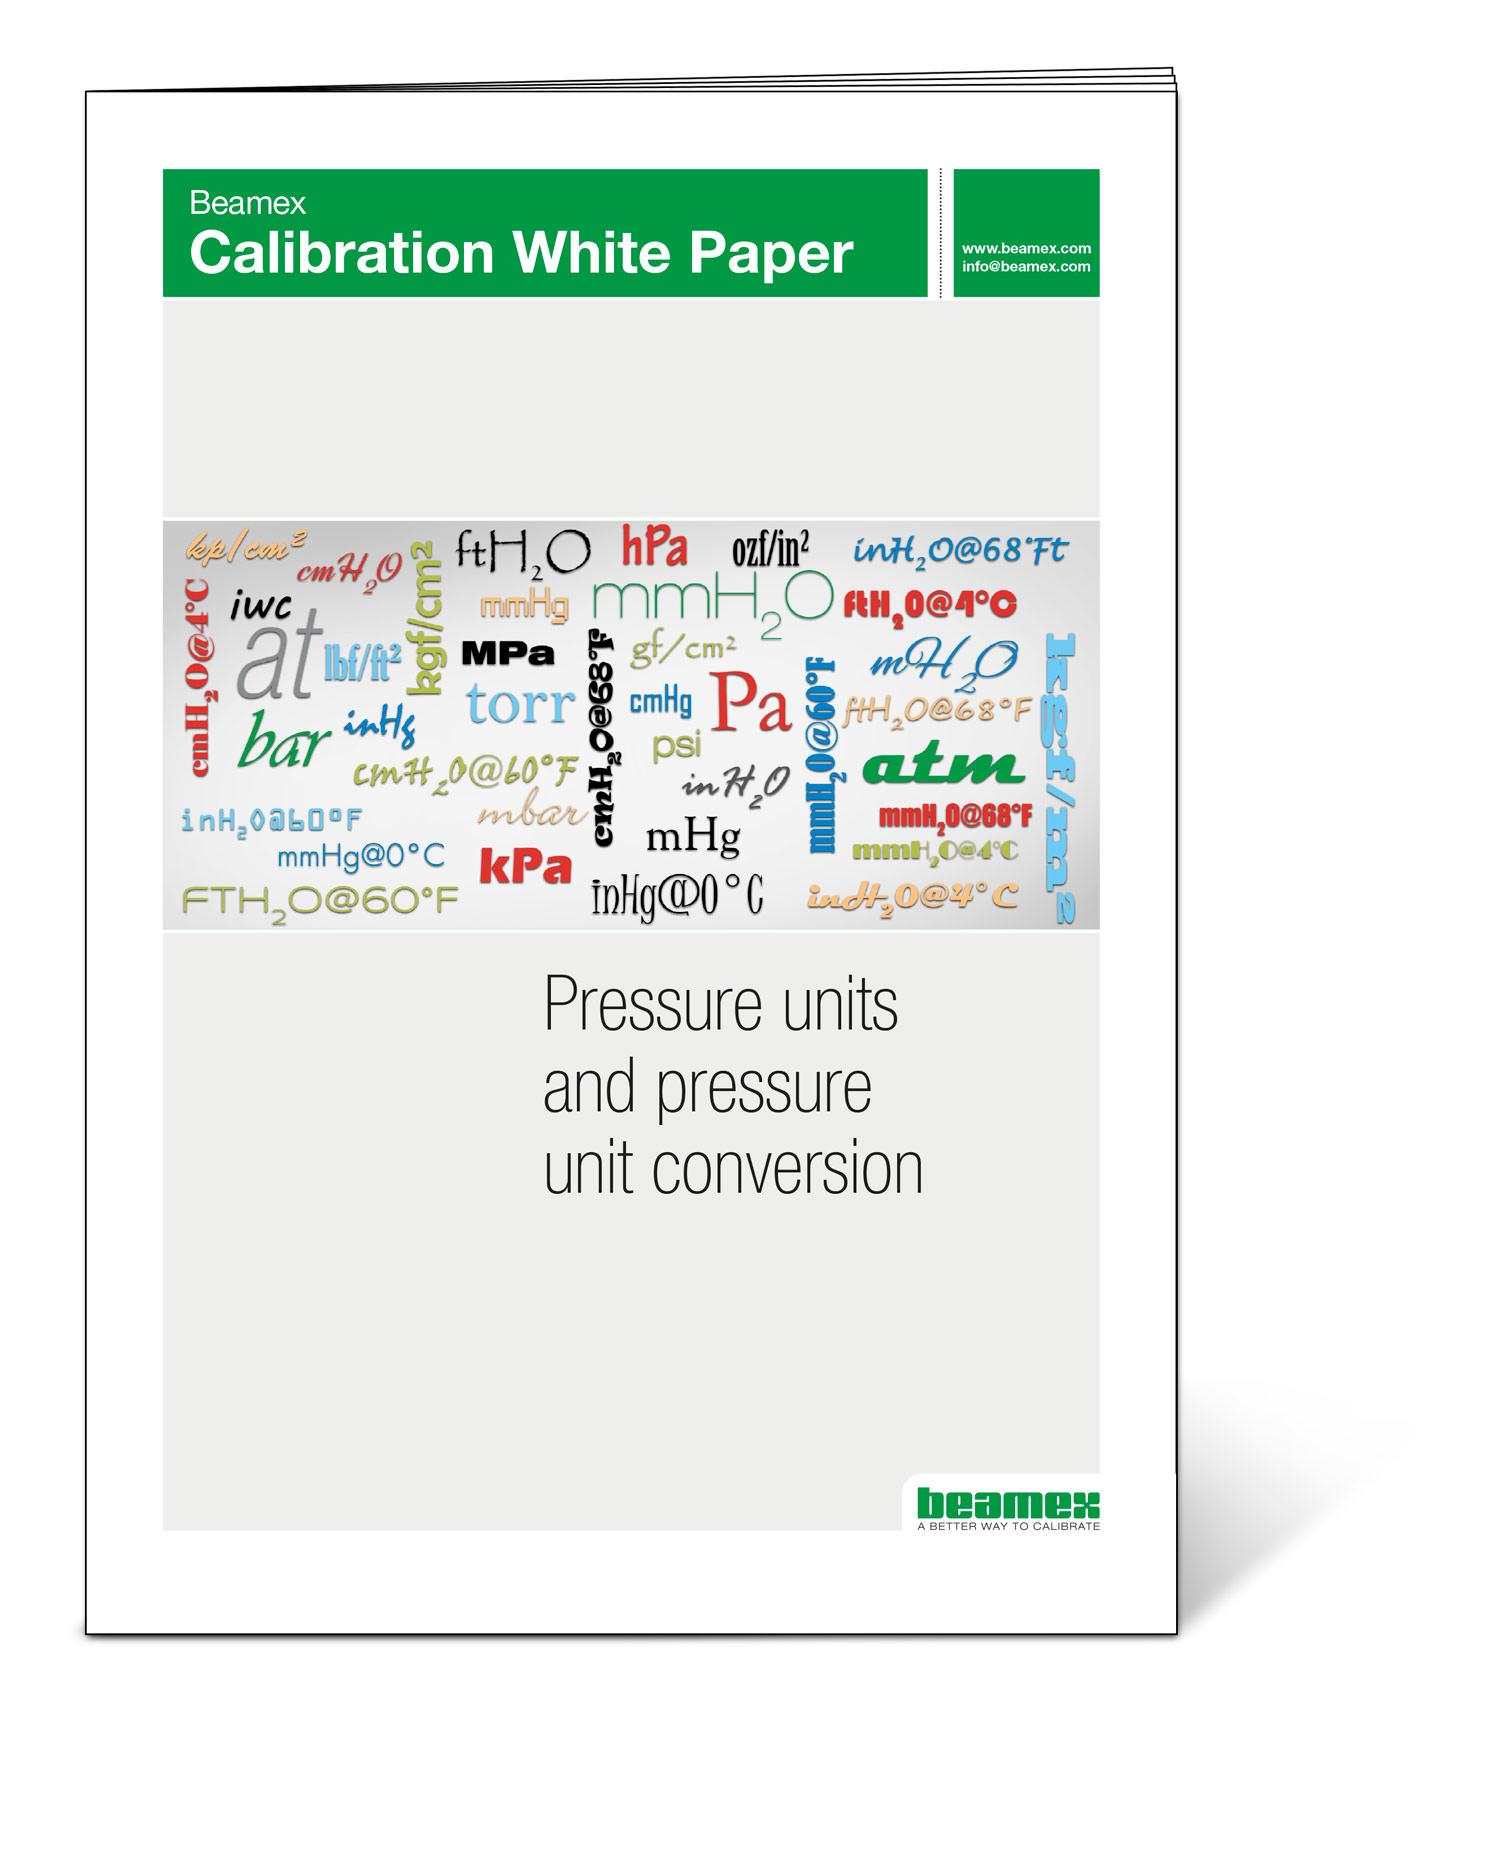 Pressure units and pressure unit conversion - Beamex white paper